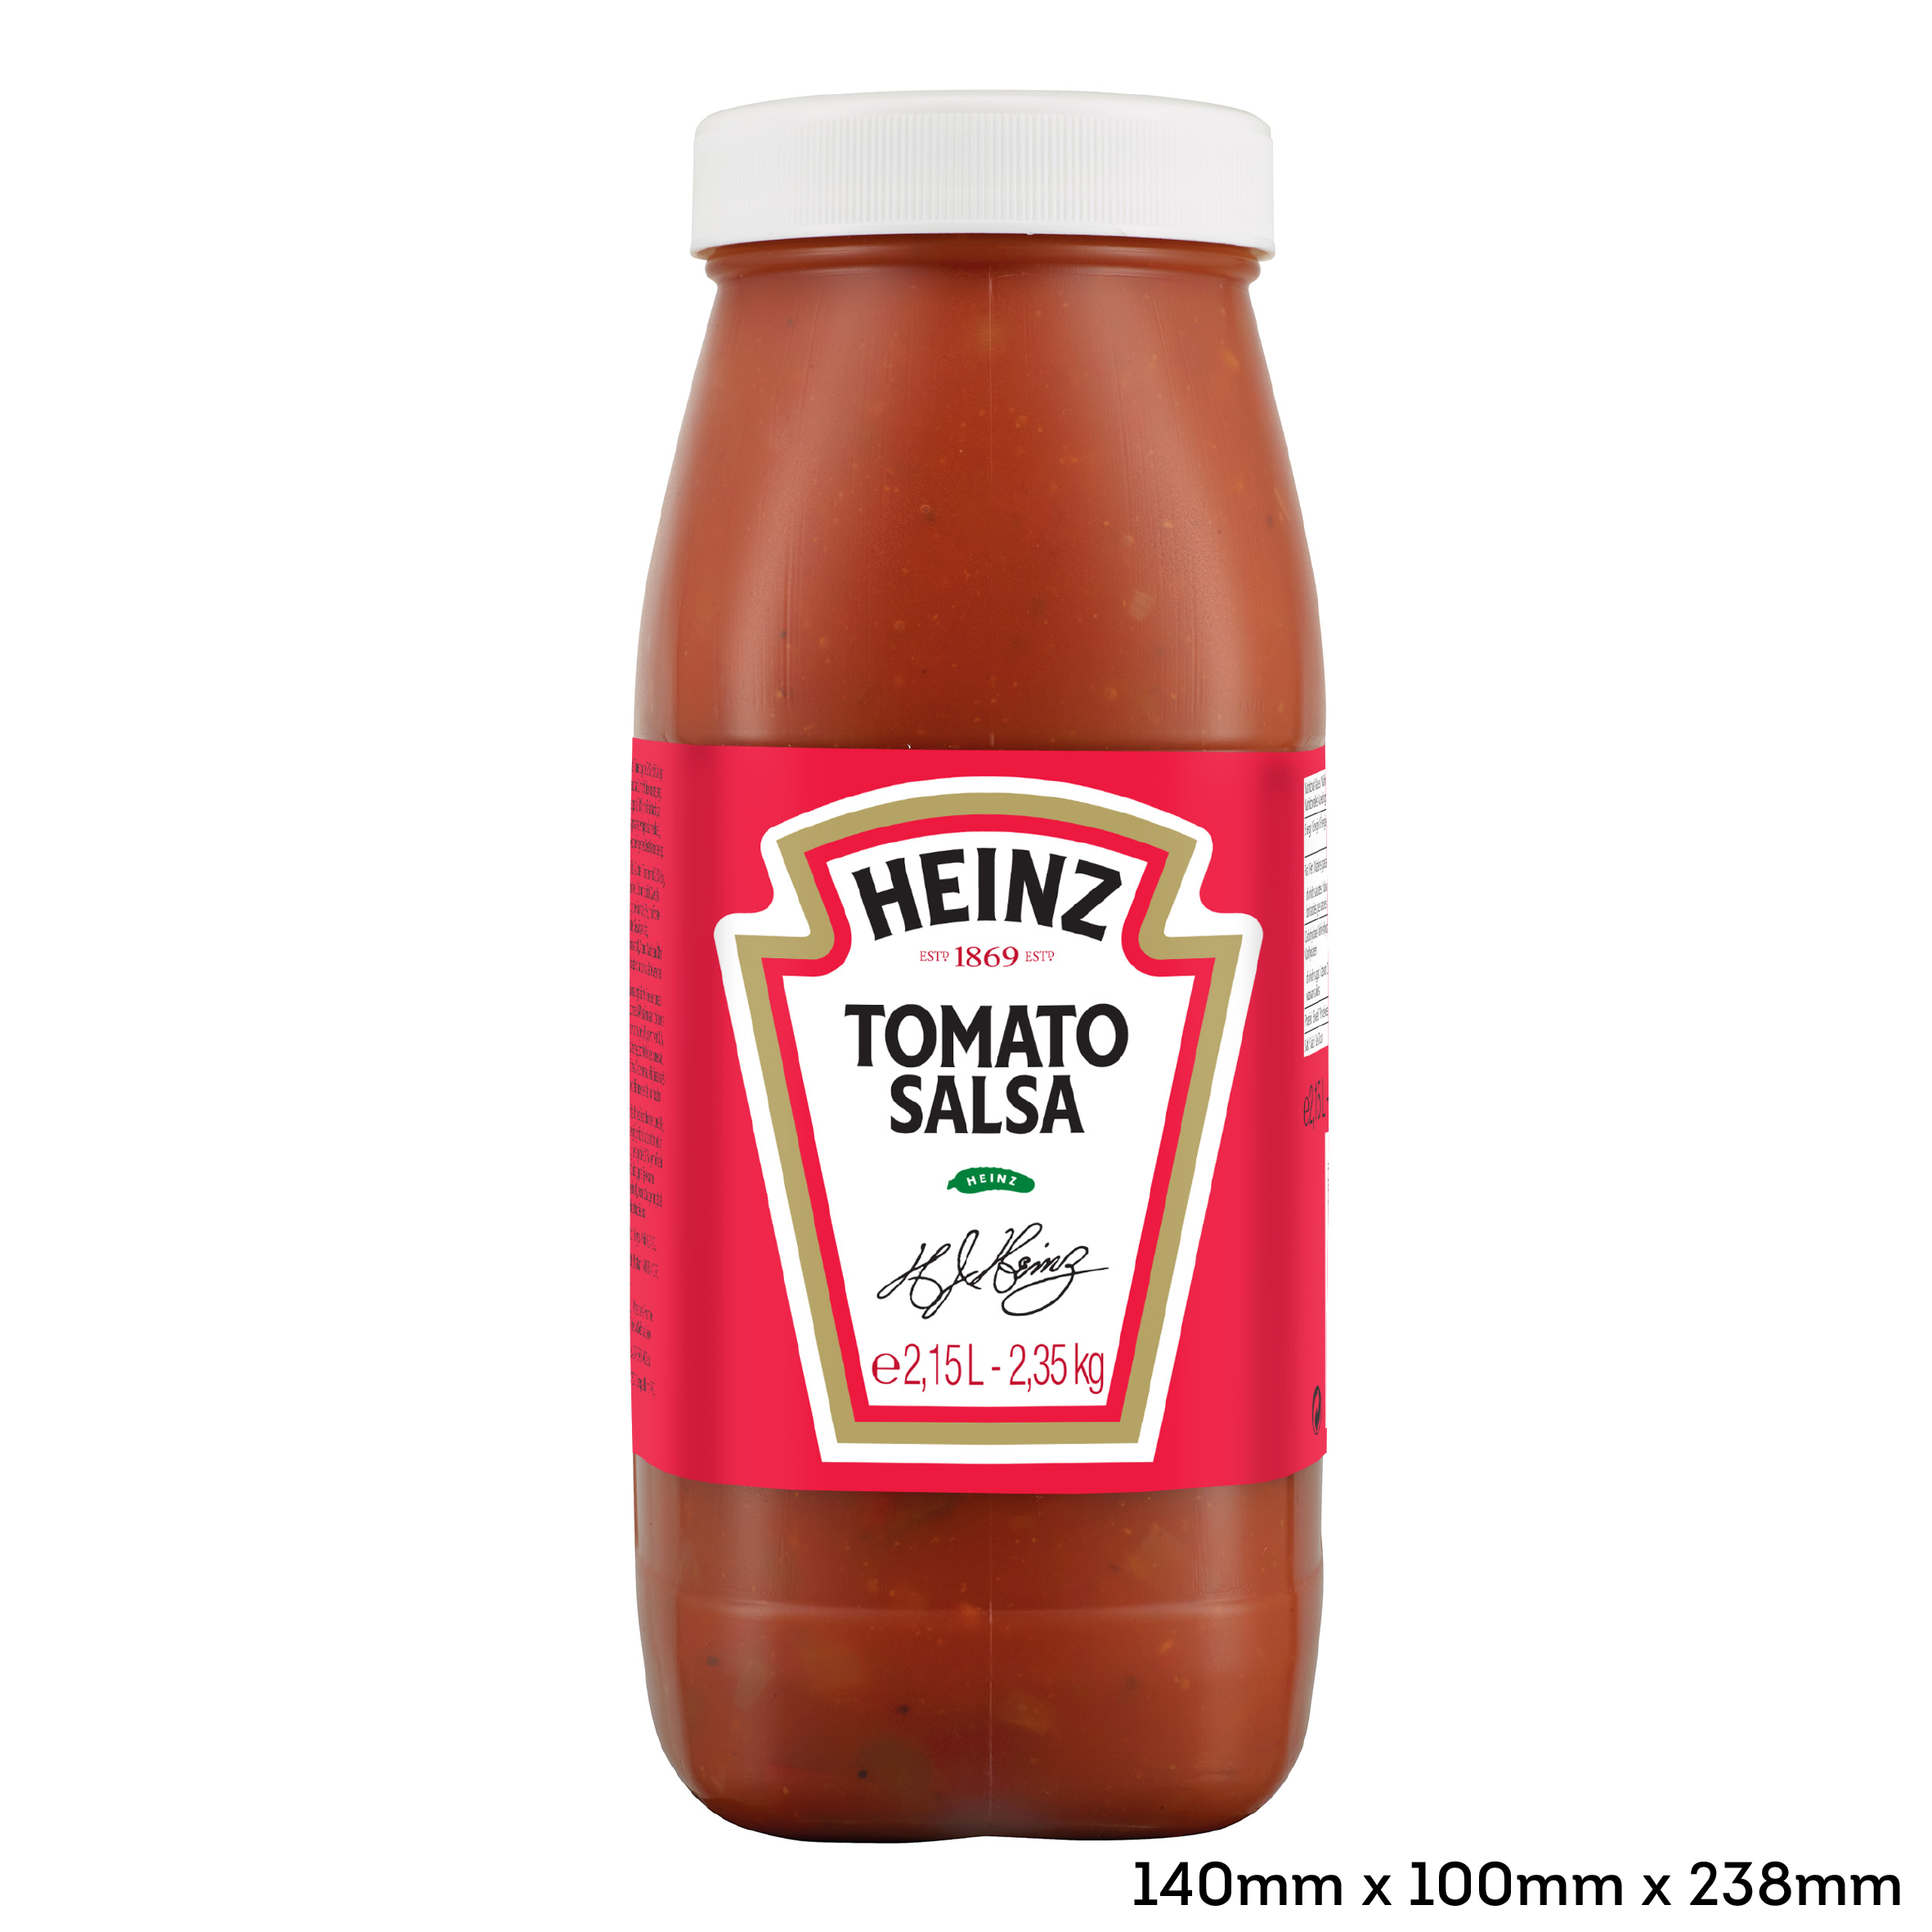 Heinz Tomato Salsa 2150ml